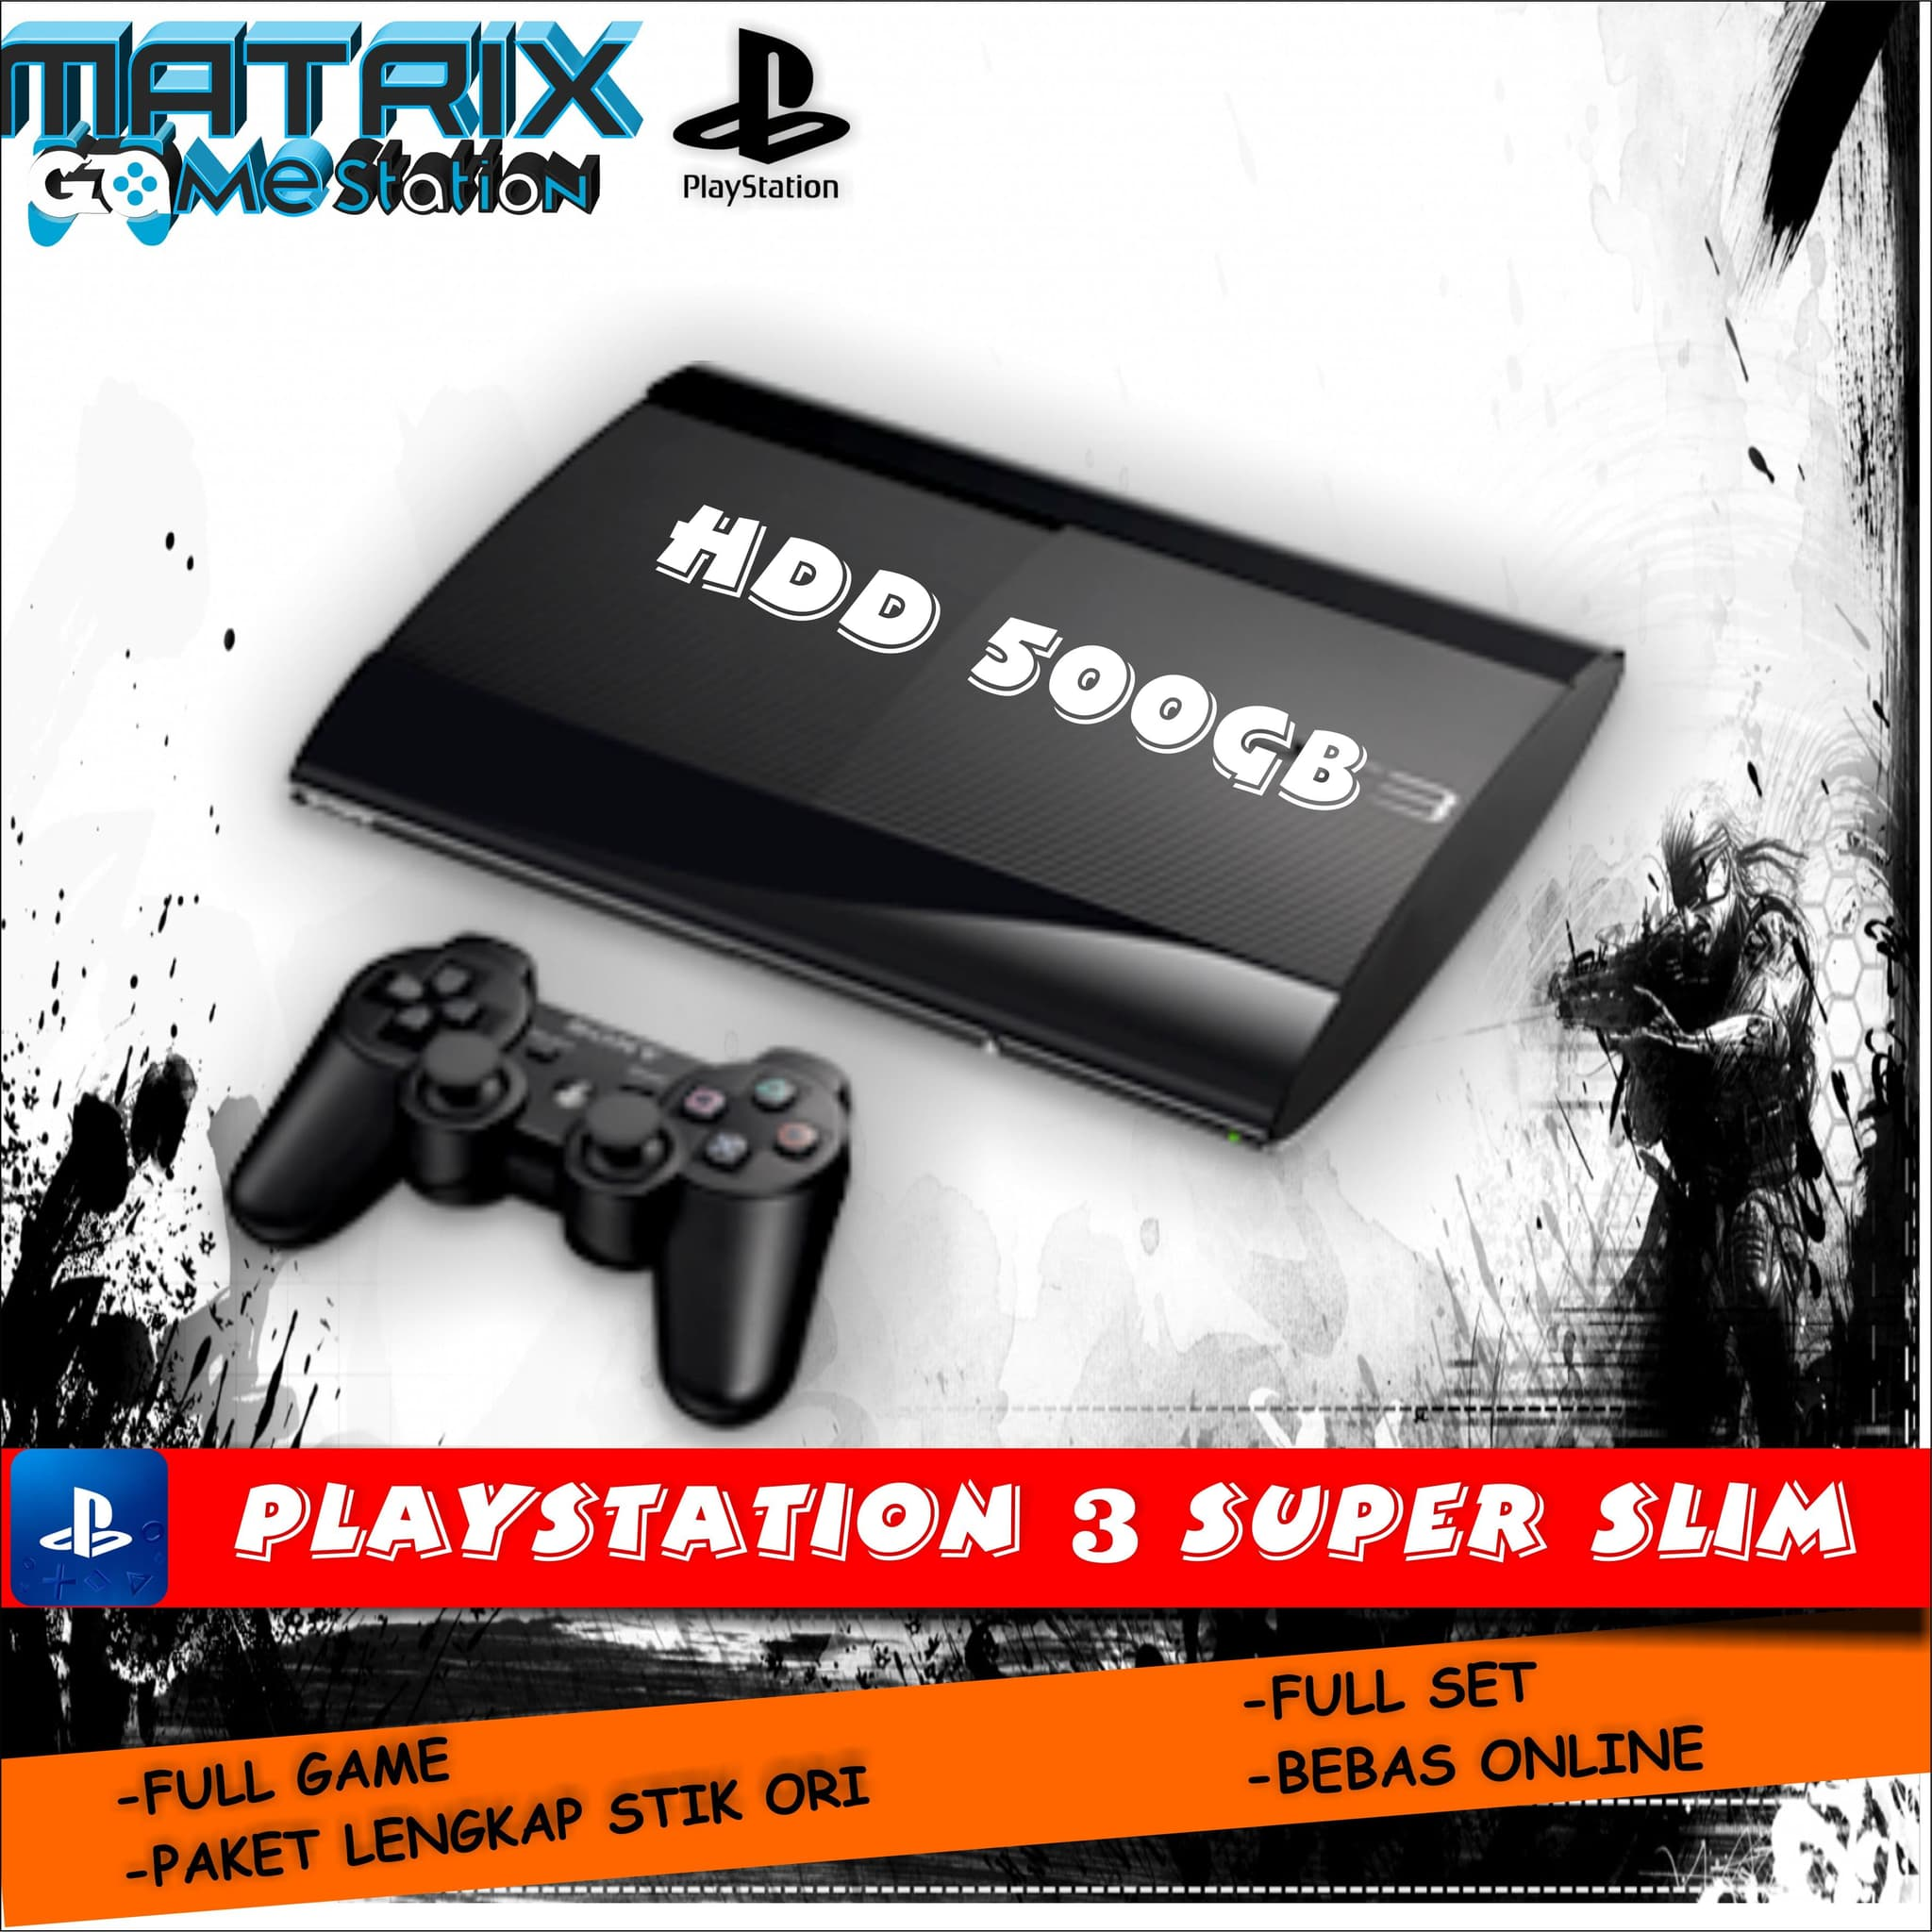 Playstation 3 Super Slim 500gb Full Games 1 Stick Promo